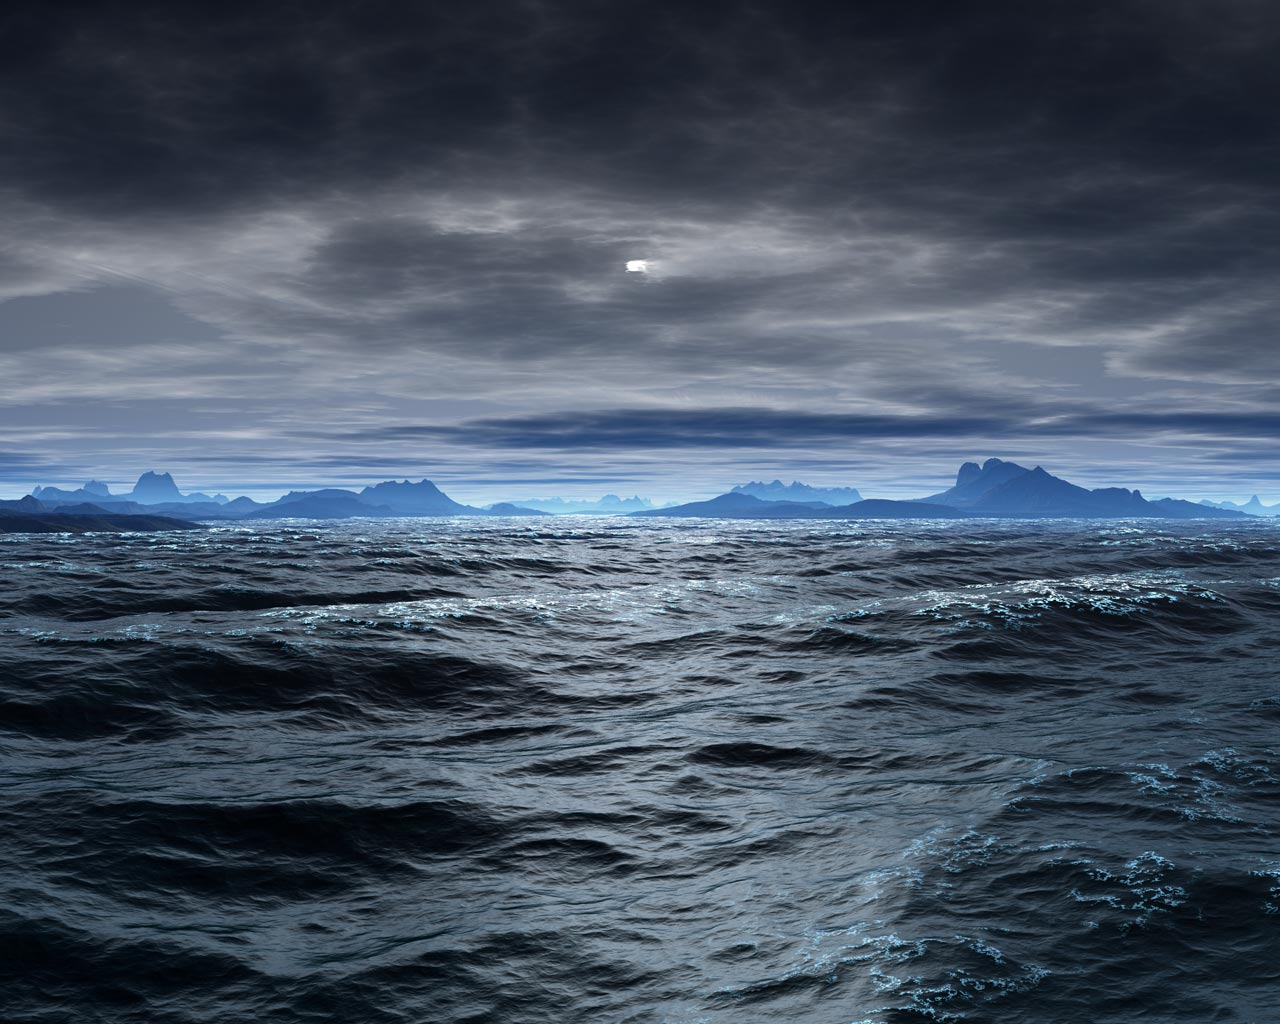 Wallpapers Online Best Collection Of Ocean Wallpapers Ever 1280x1024